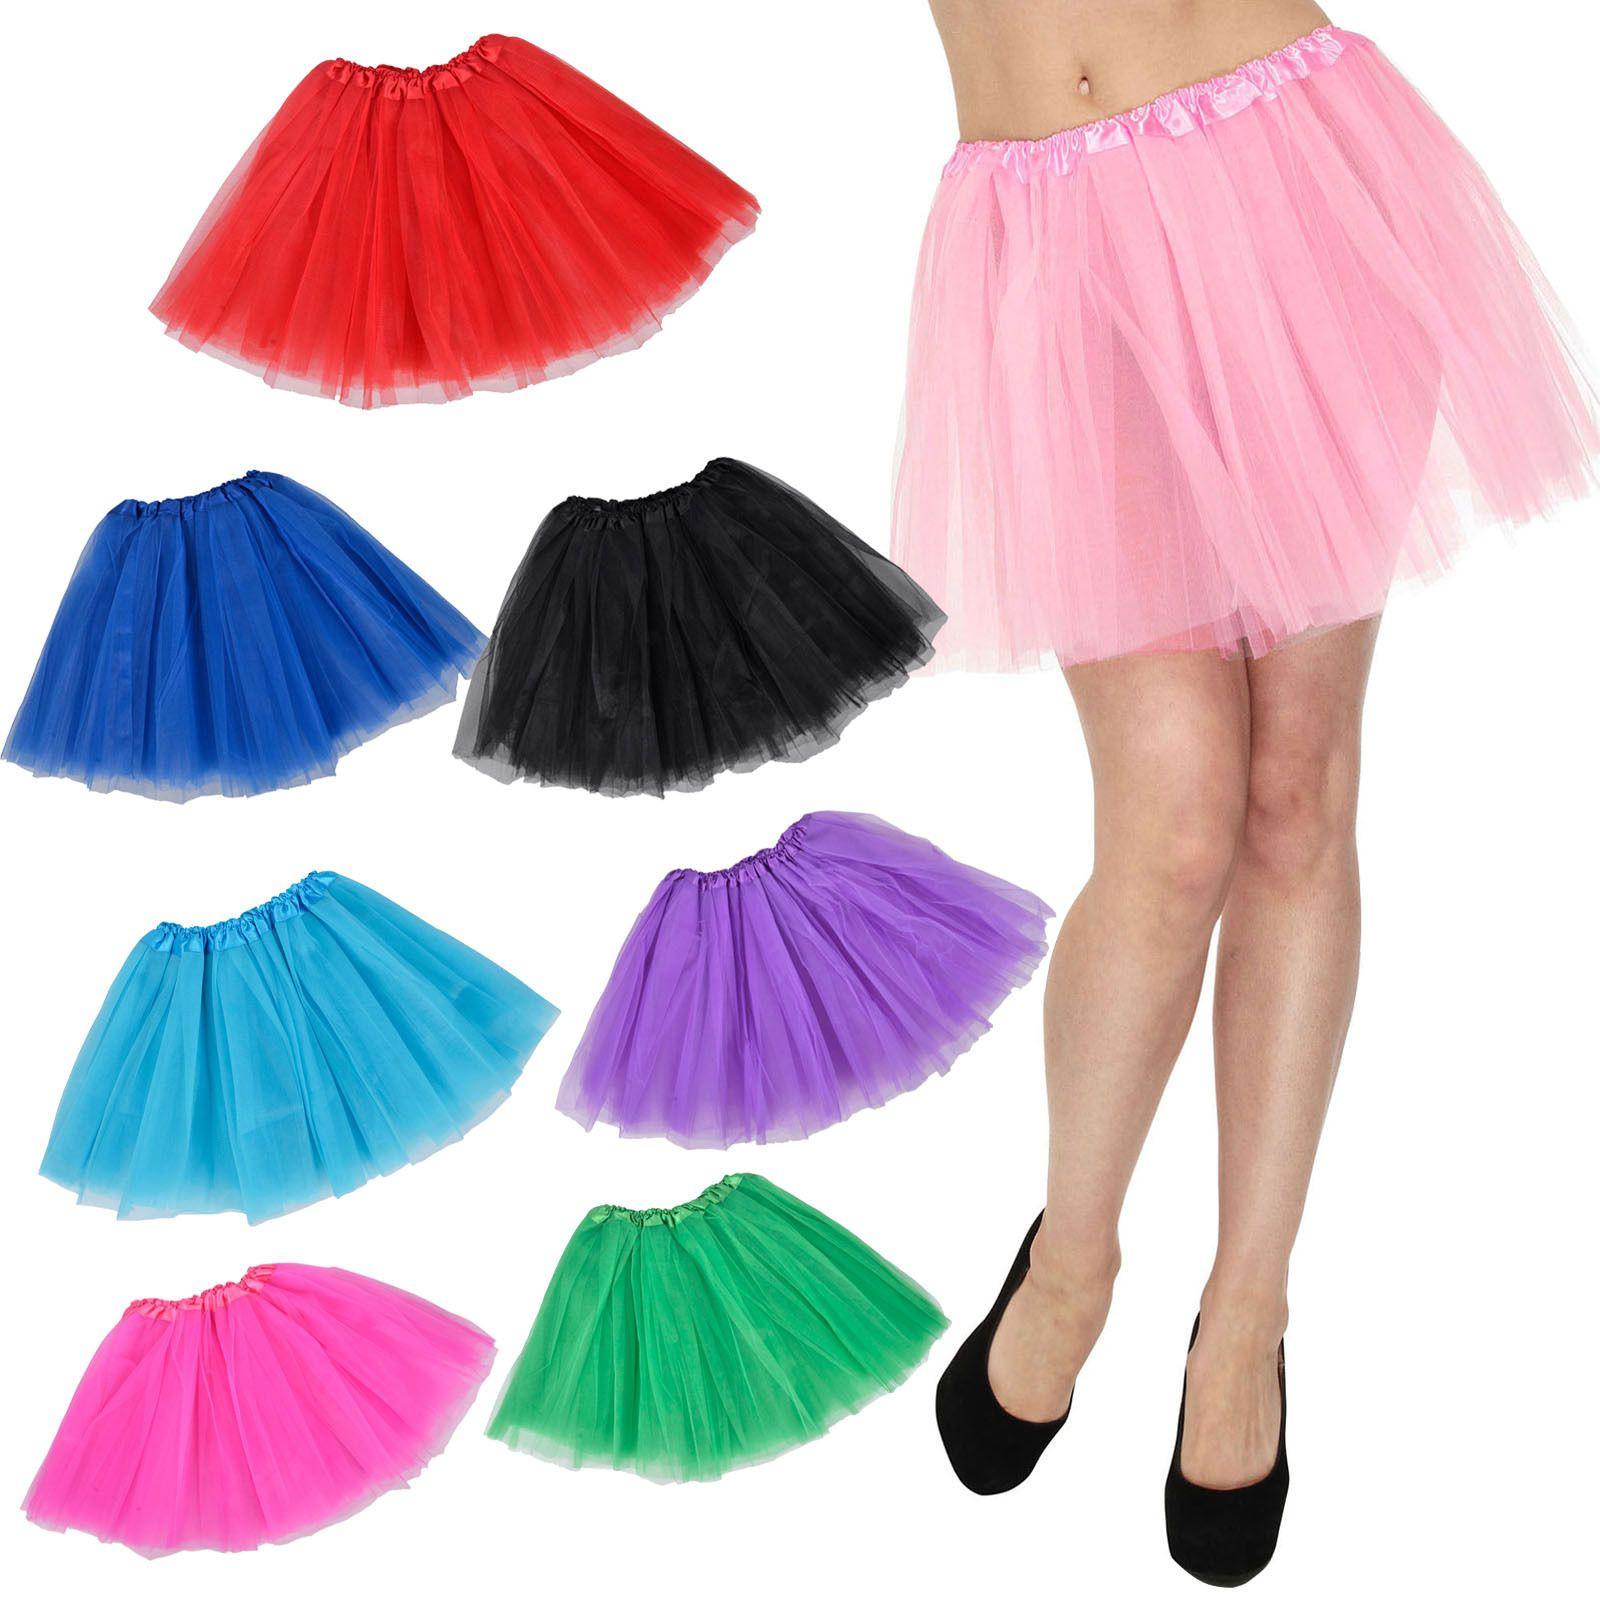 Women Adult Dancewear Tutu Mini Ballet Pettiskirt Princess Party Skirt Costume